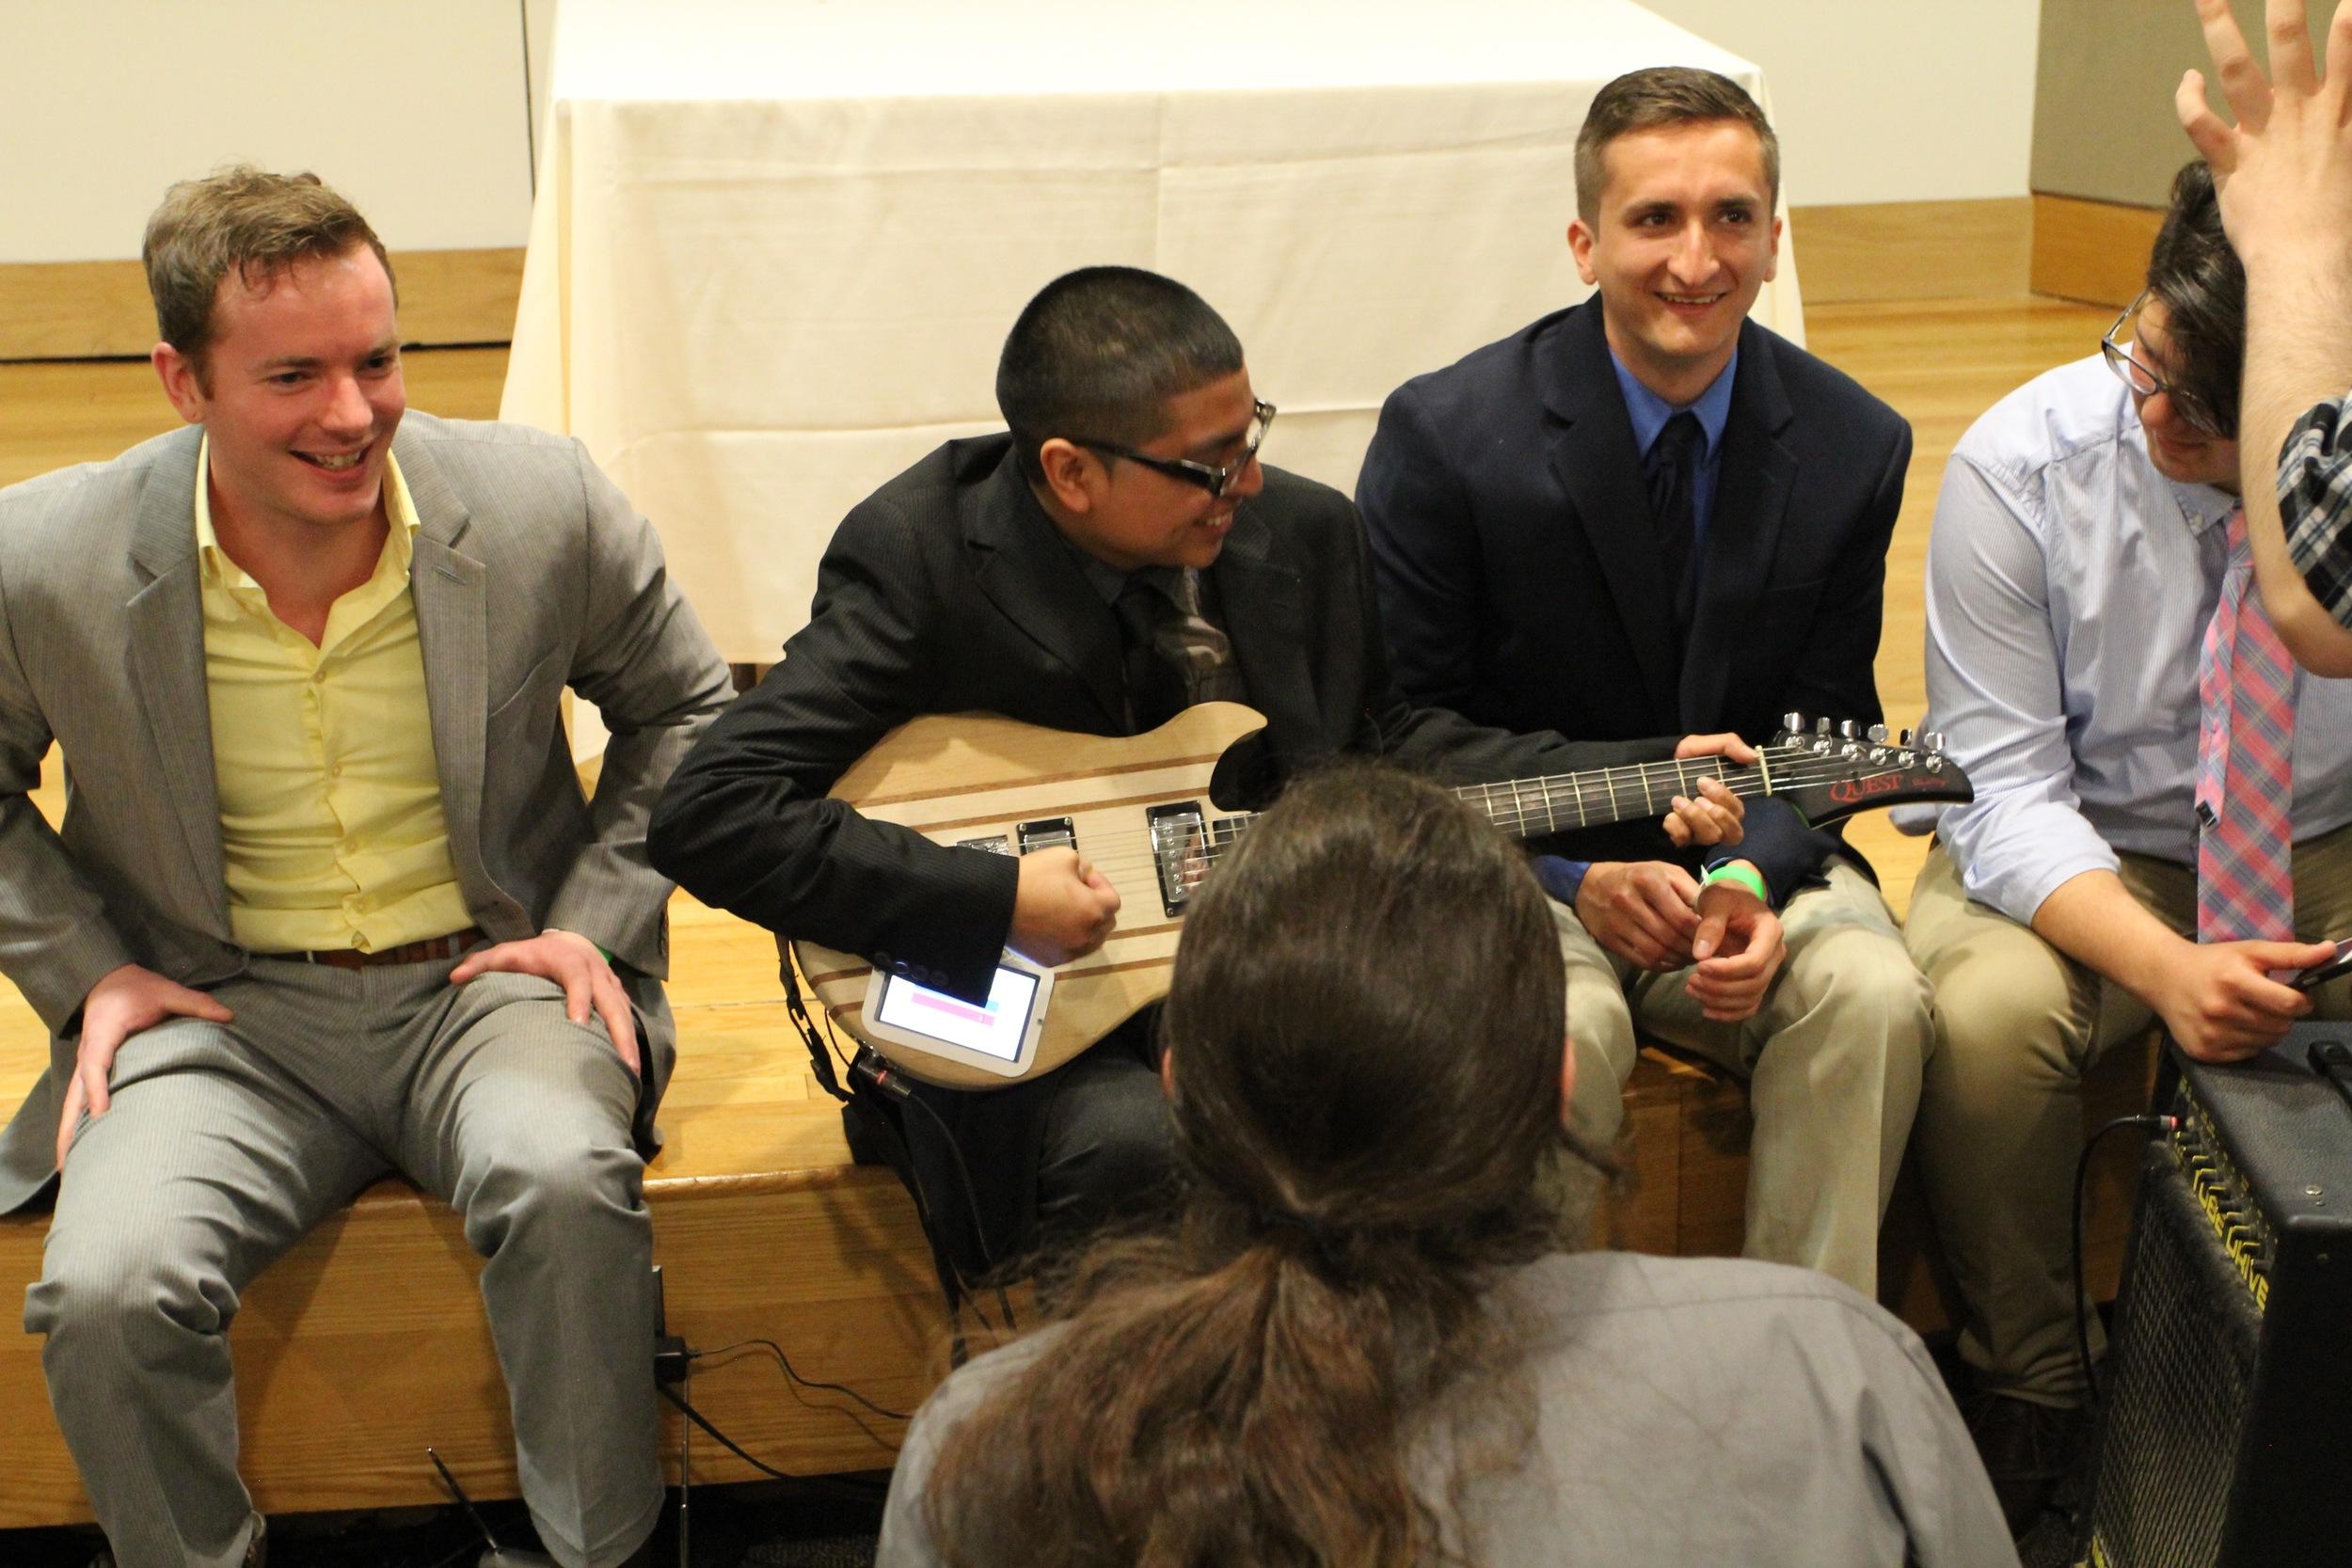 Smart Guitar Team